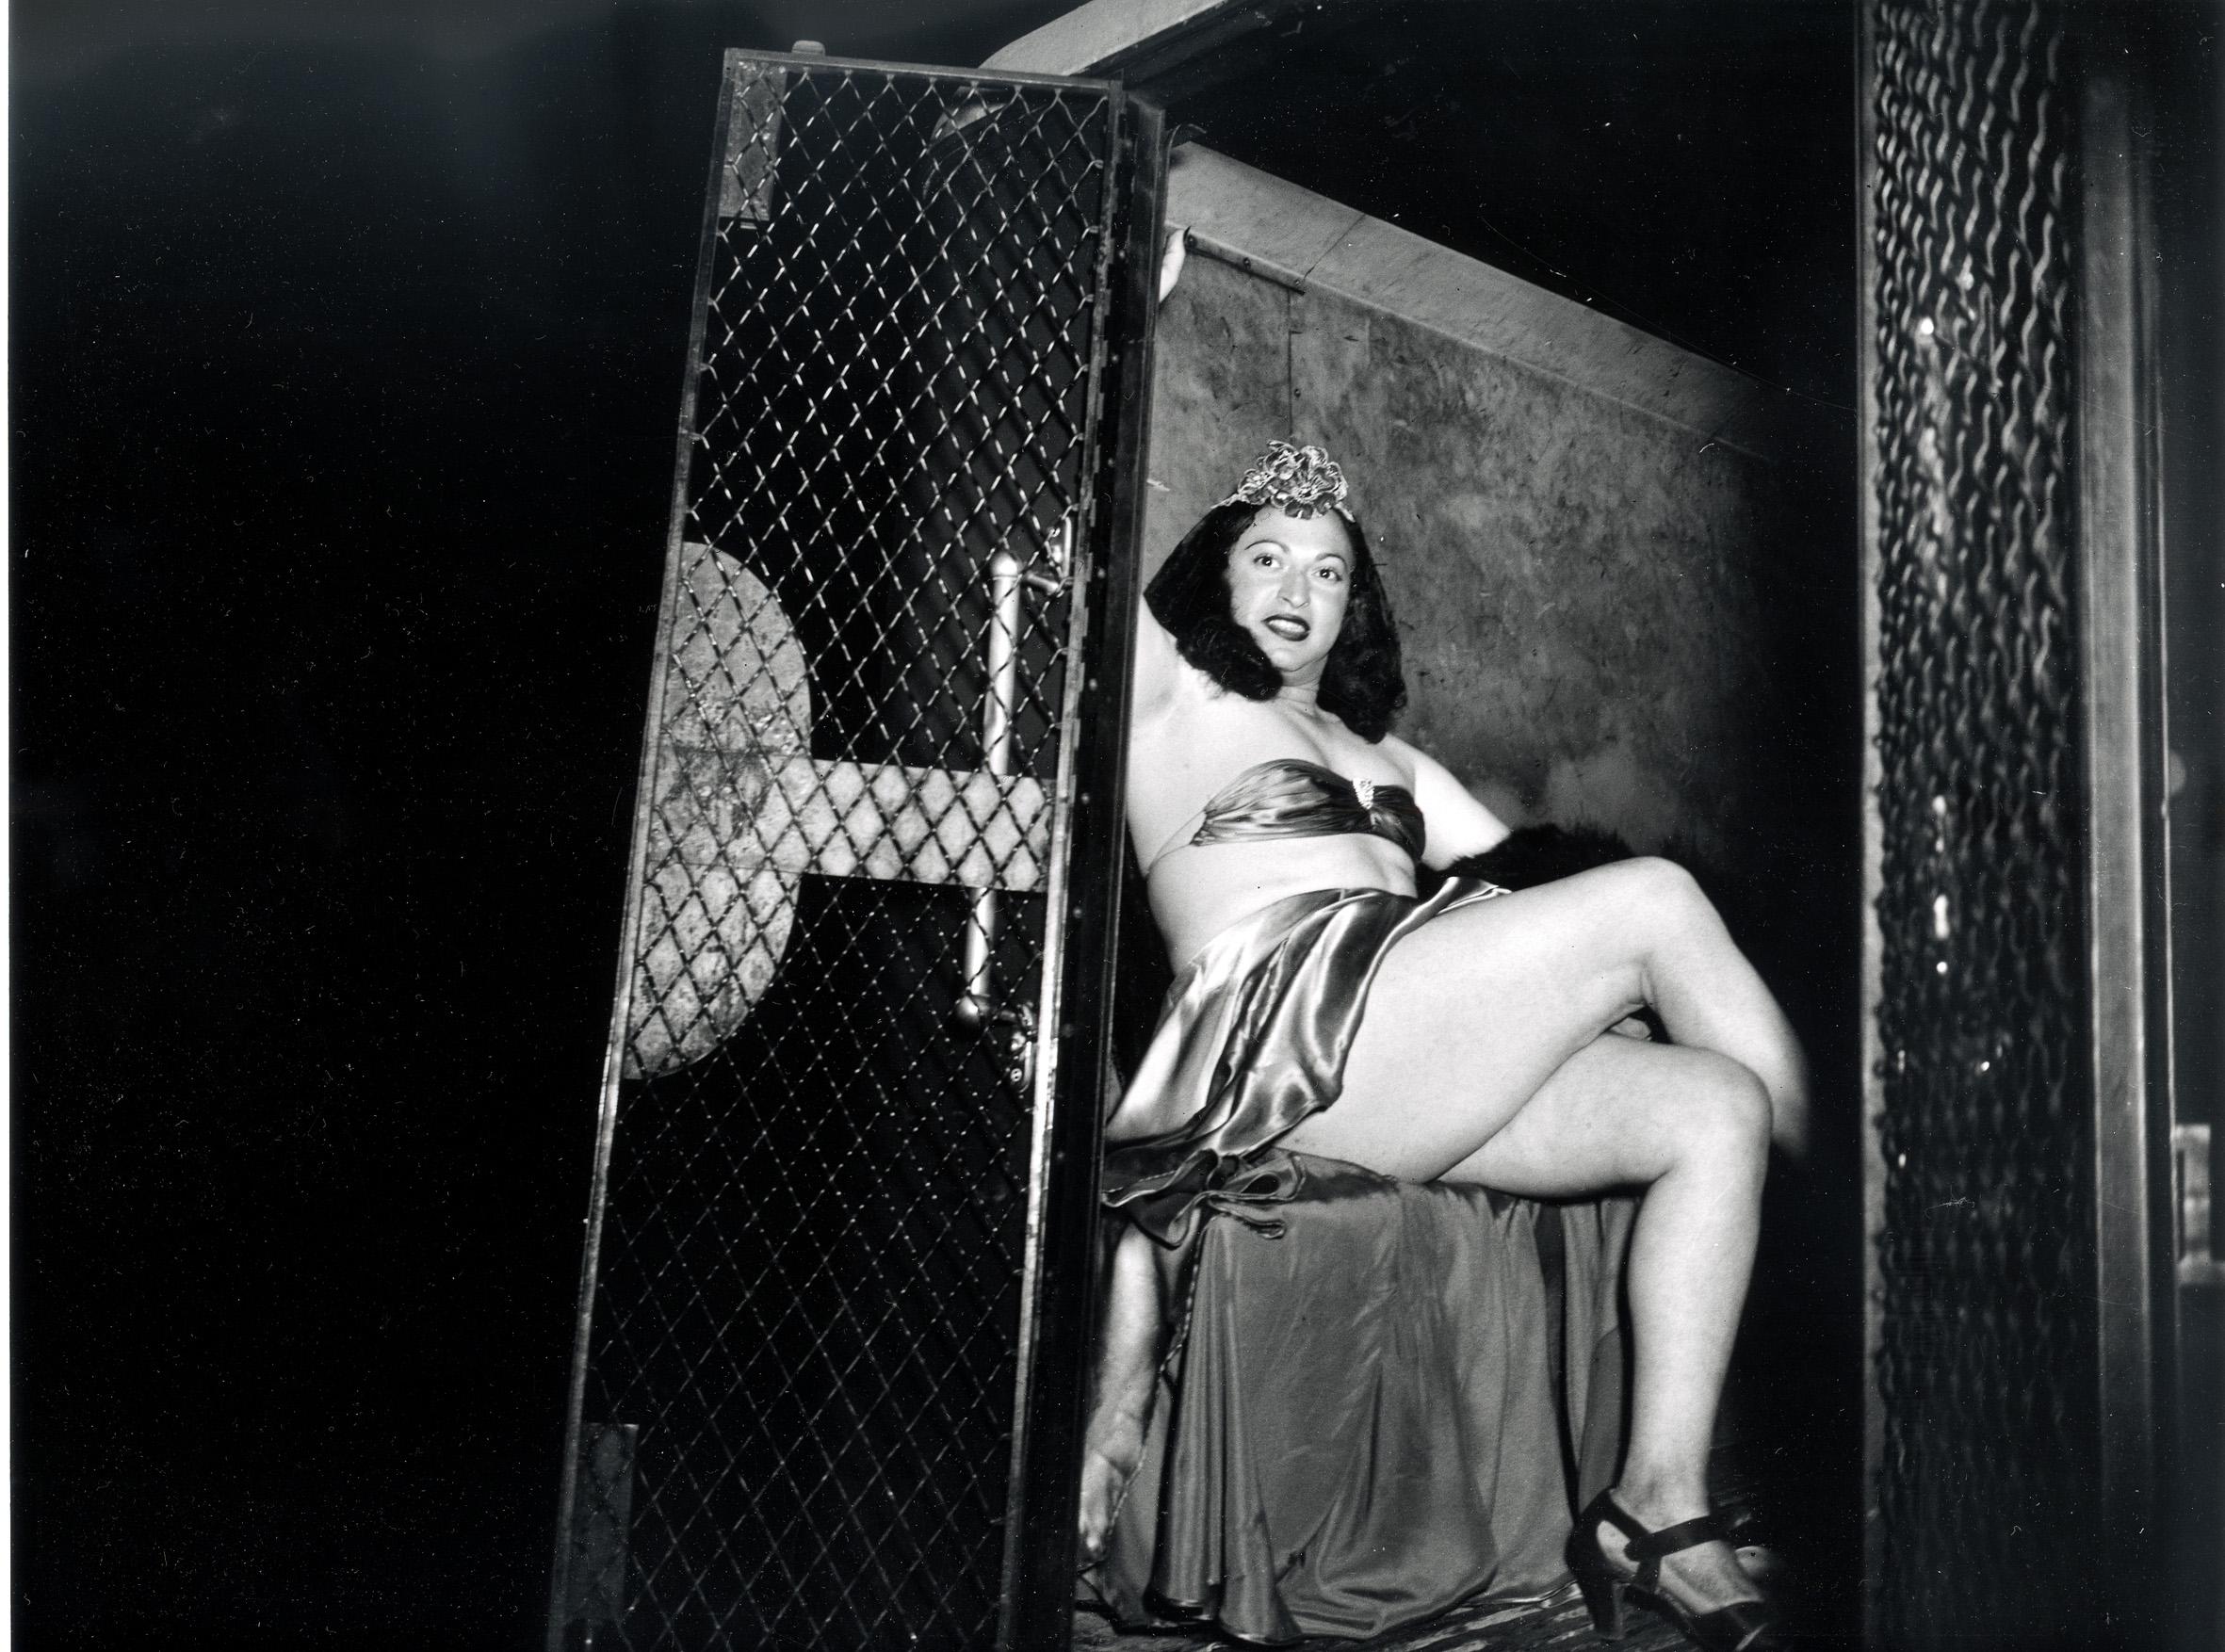 Fotó: Weegee: ... a rabomobilban, 1939 k. © Courtesy Institute for Cultural Exchange, Germany 2018